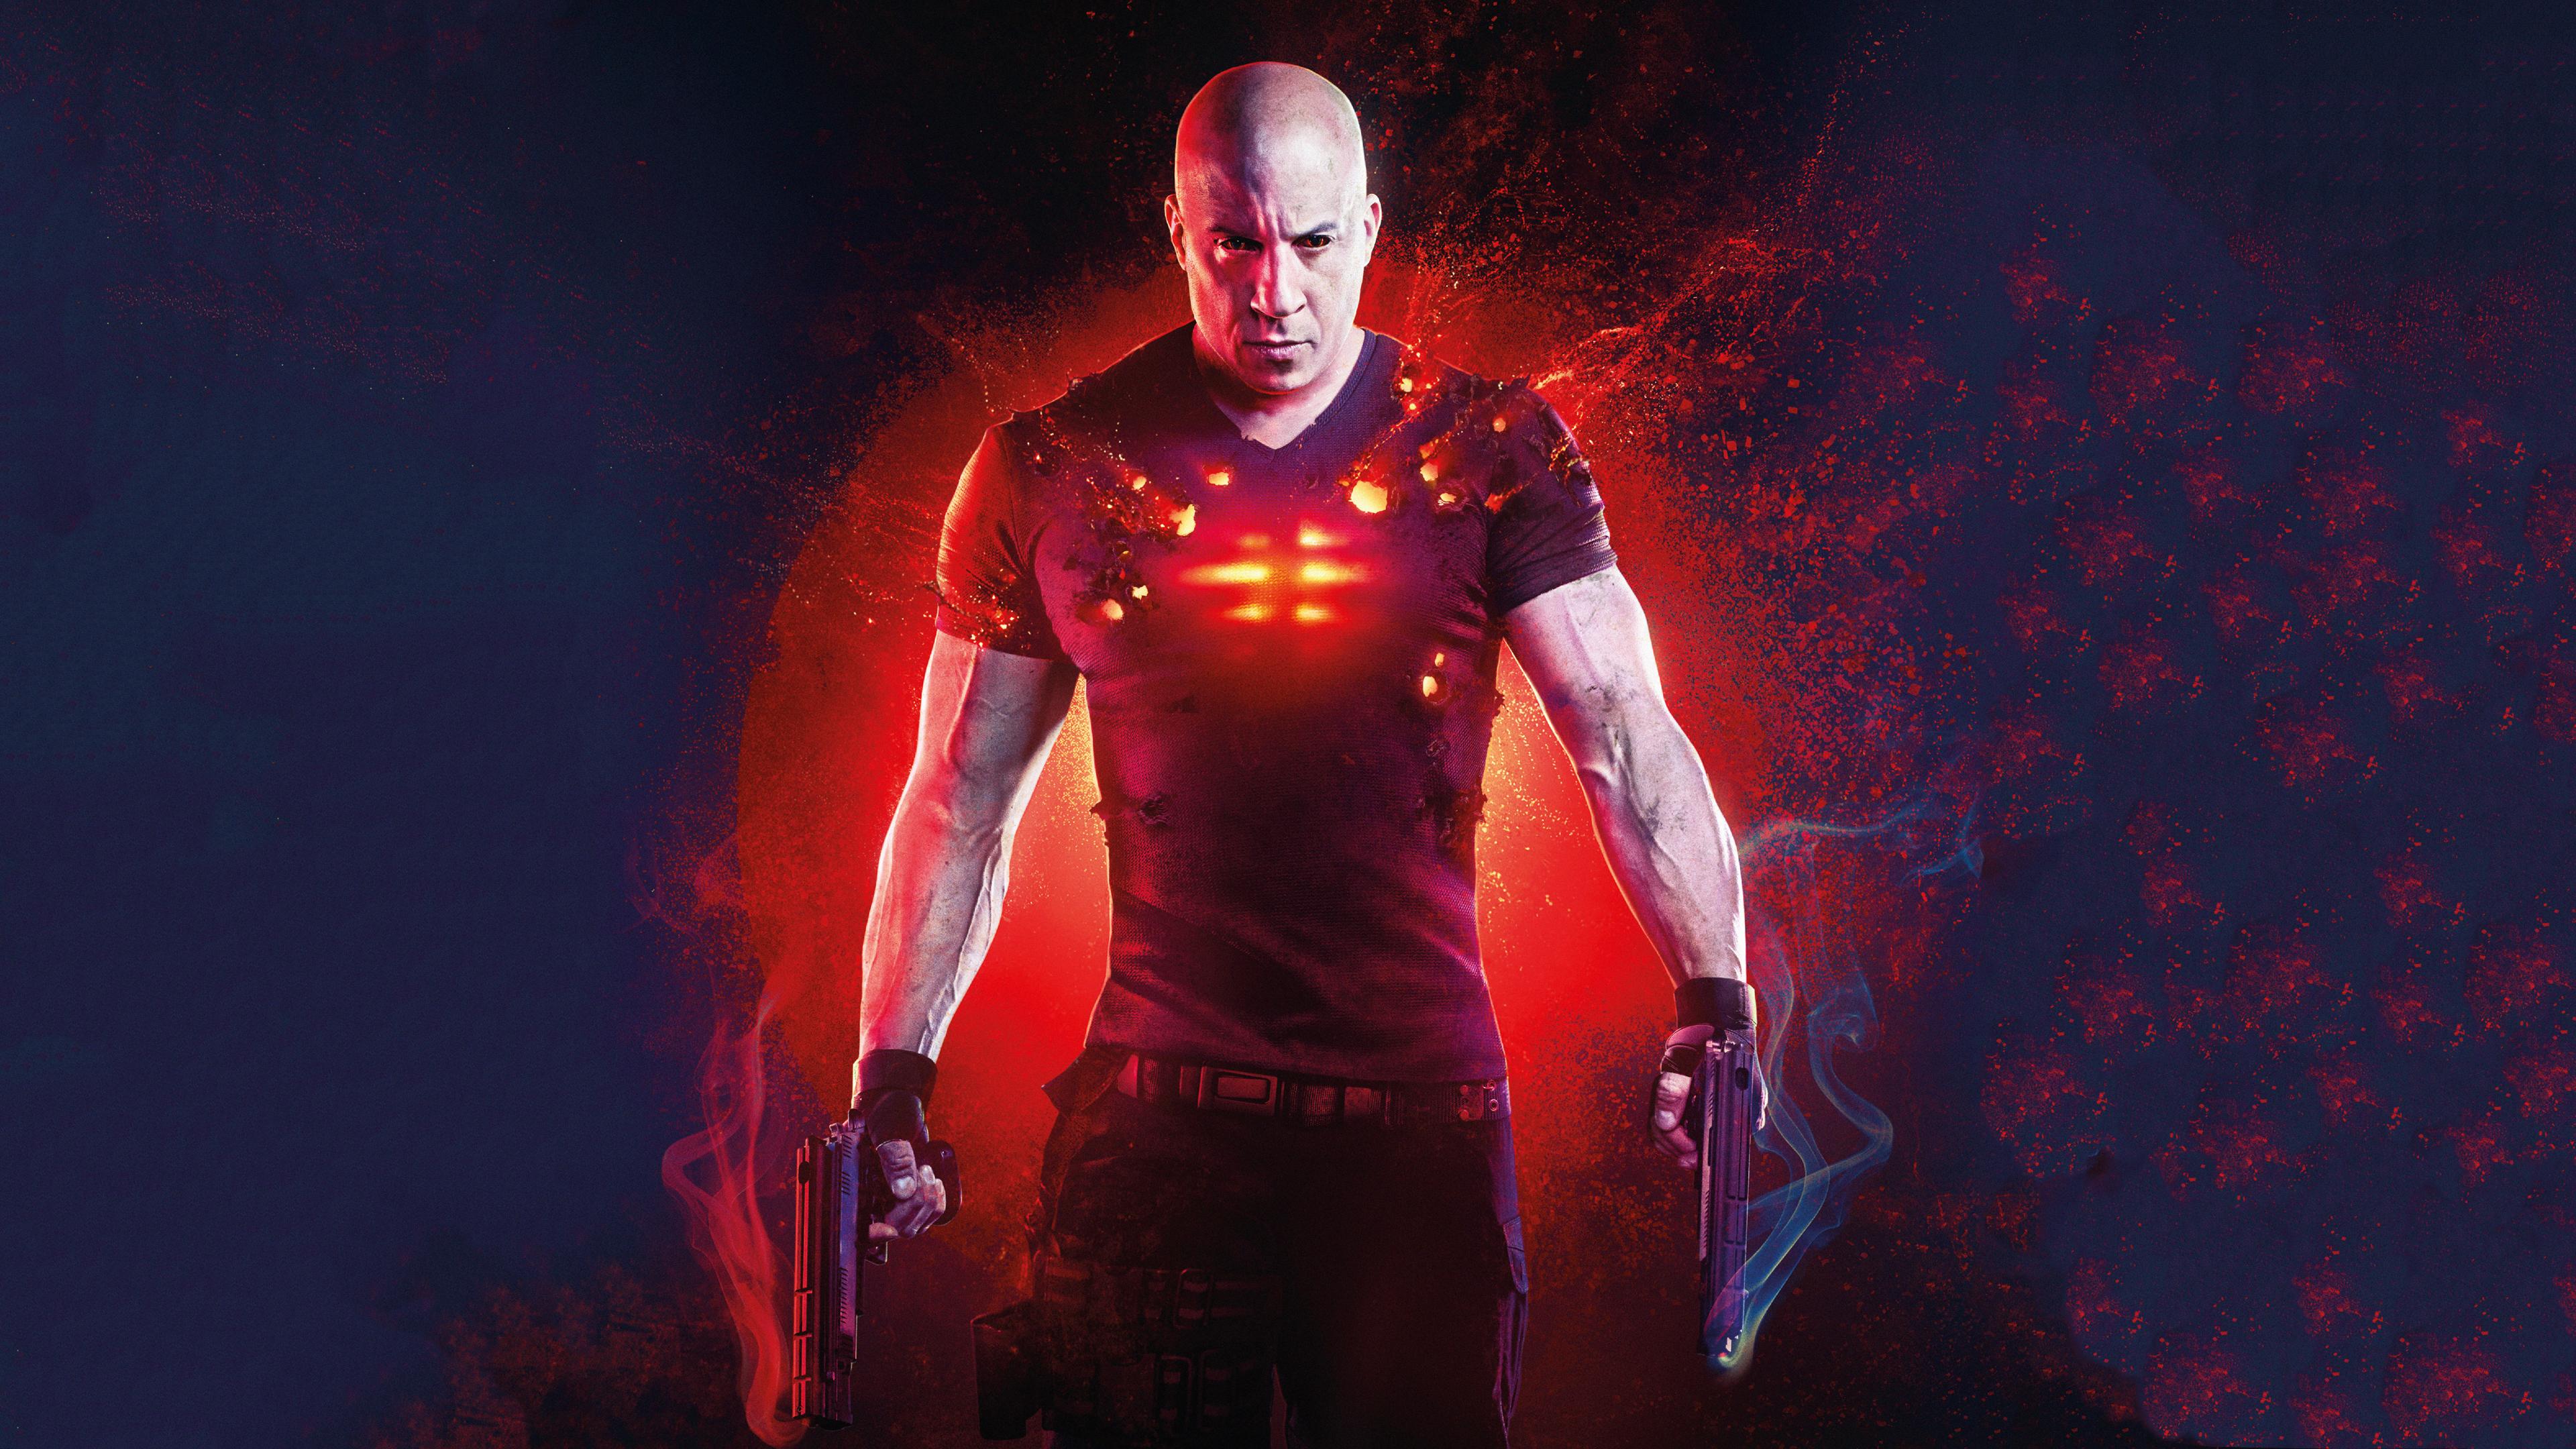 3840x2160 4K Bloodshot 2020 Movie 4K Wallpaper HD Movies 4K 3840x2160